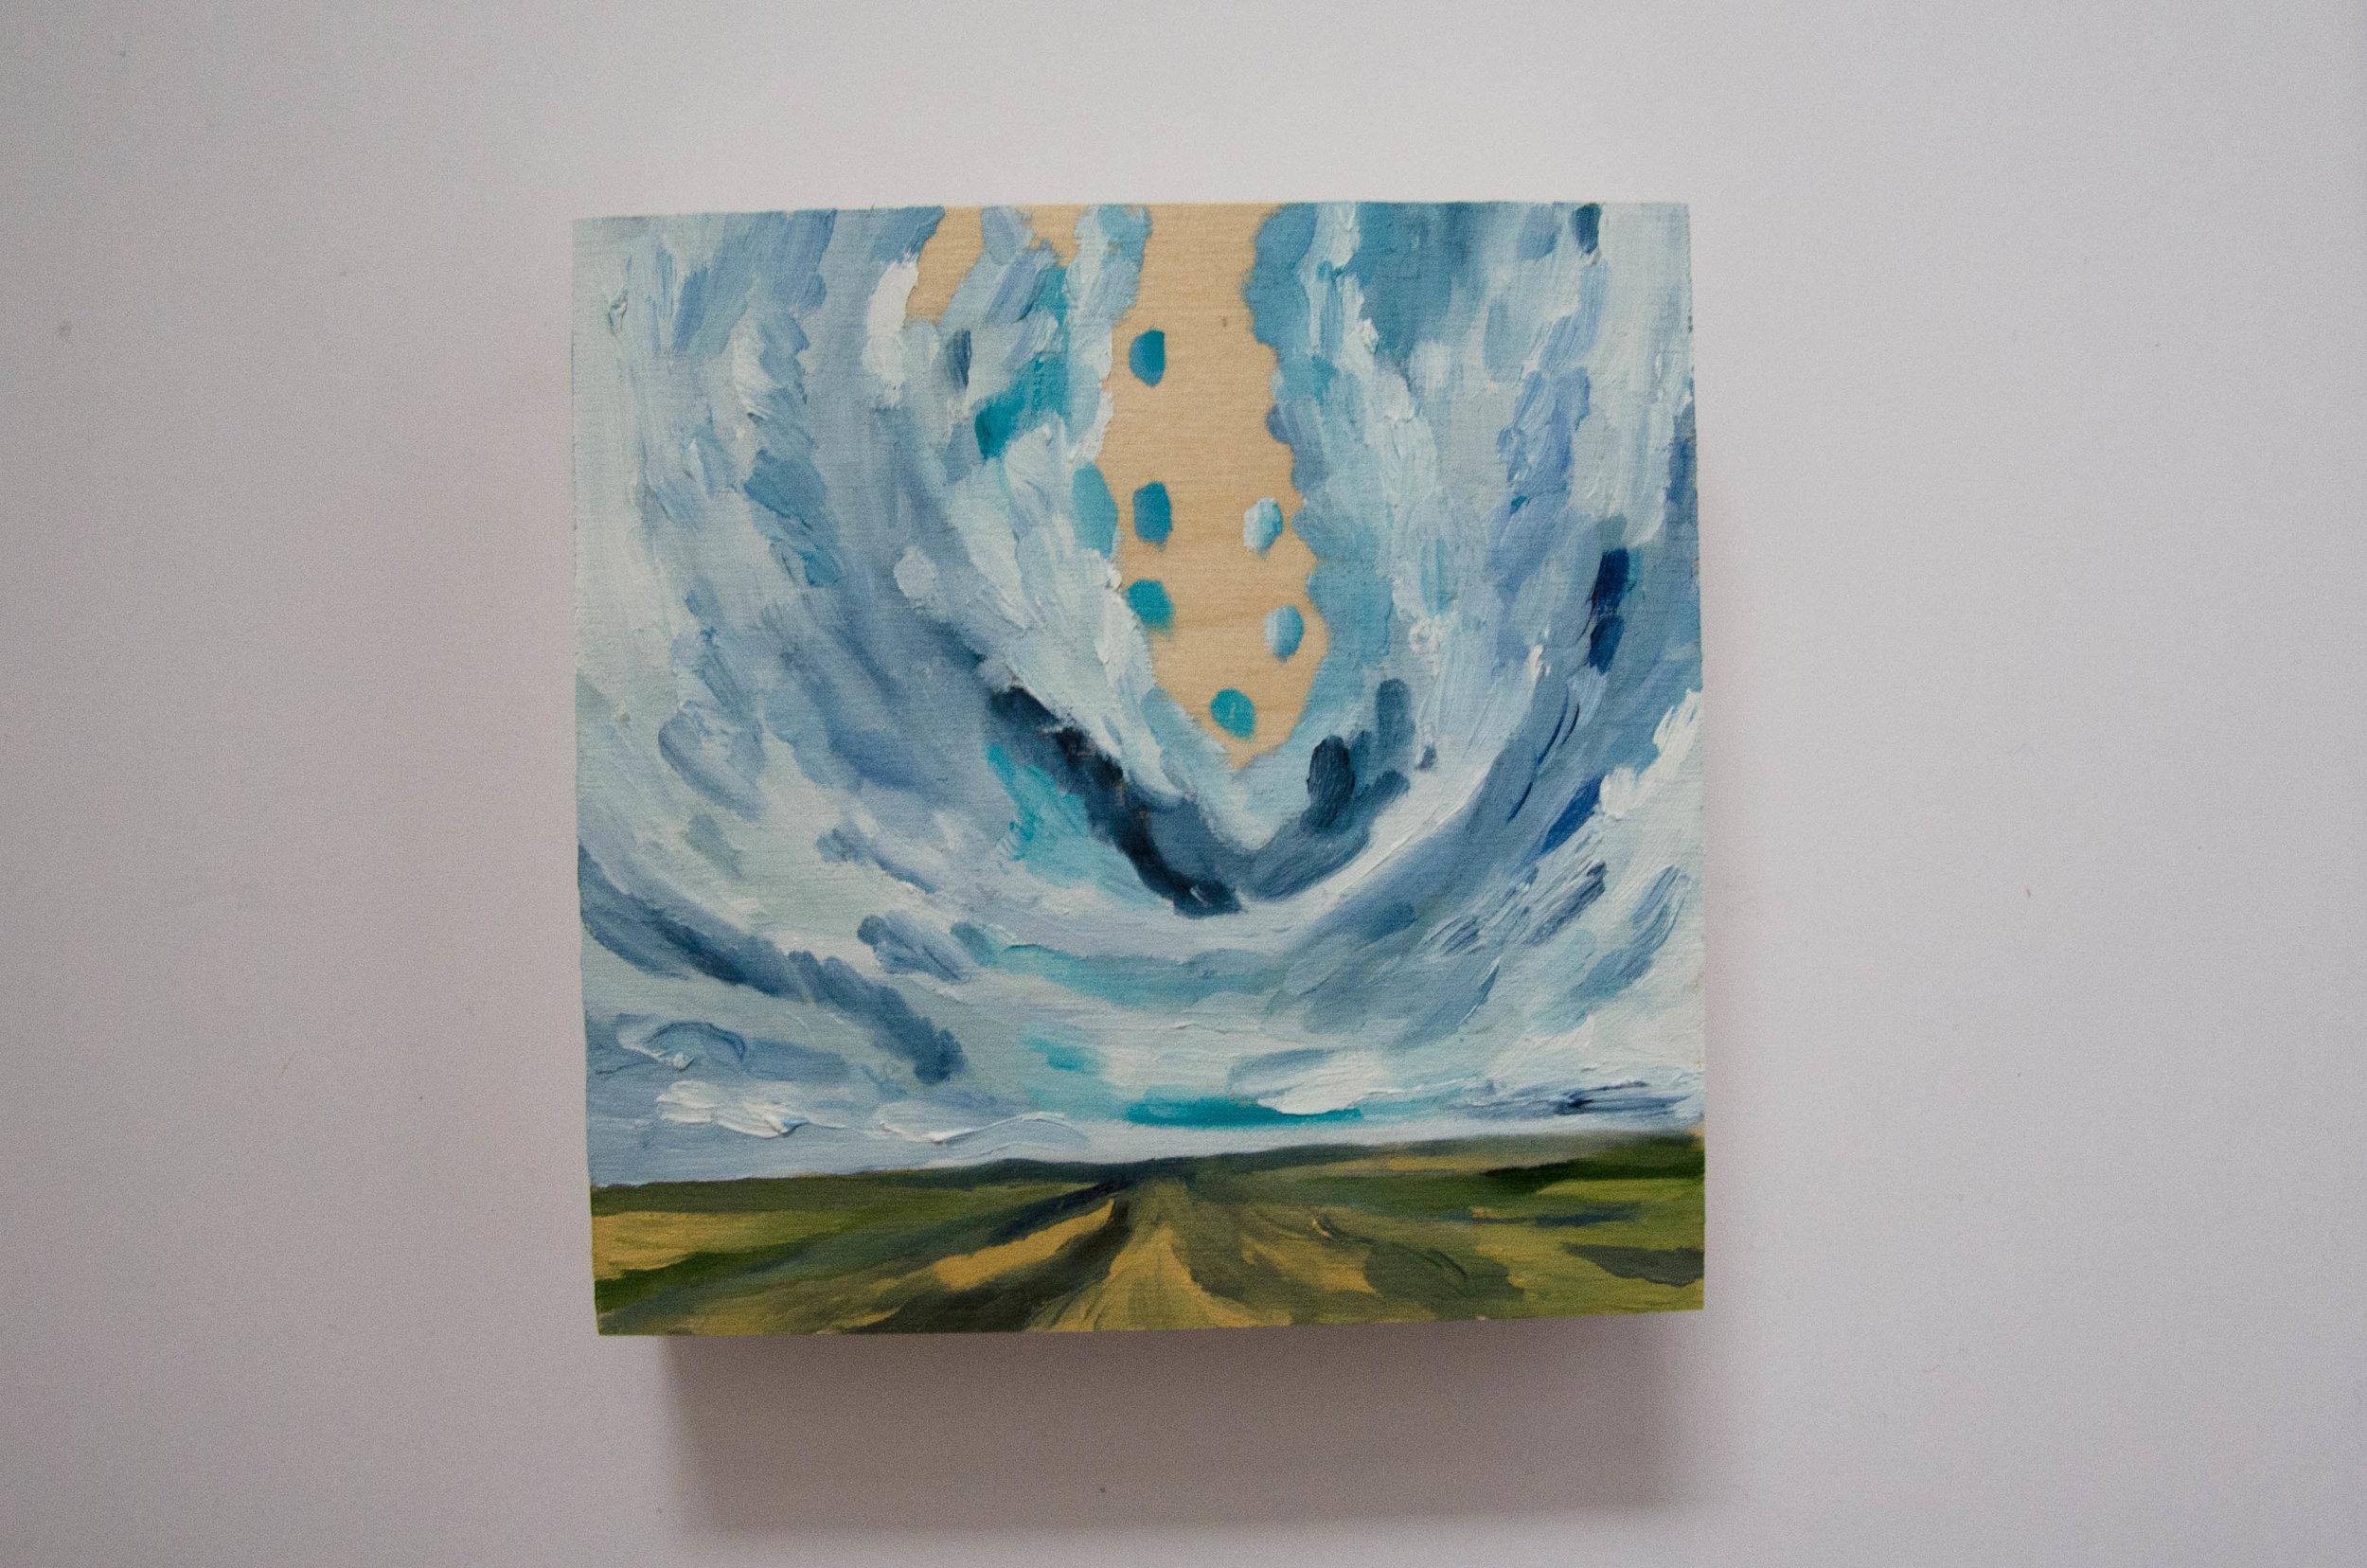 marysia-champ-canadian-prairie-landscape-artist-oil-painting-artwork-paint-yyc